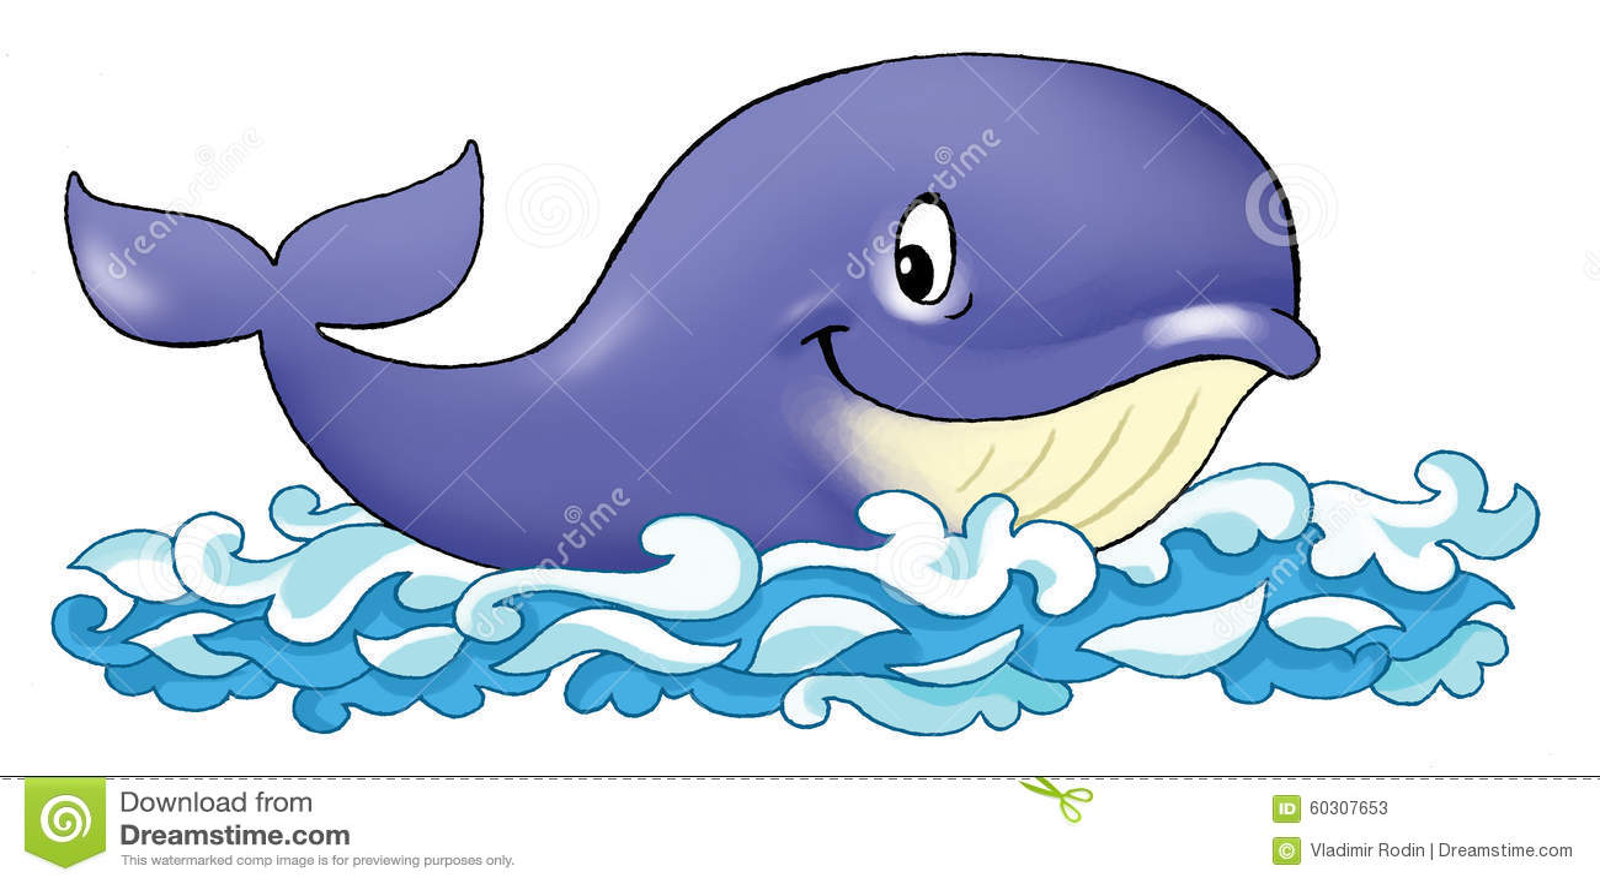 Whale Funny Cartoon Blue Pattern Stock Illustration - Image: 60307653